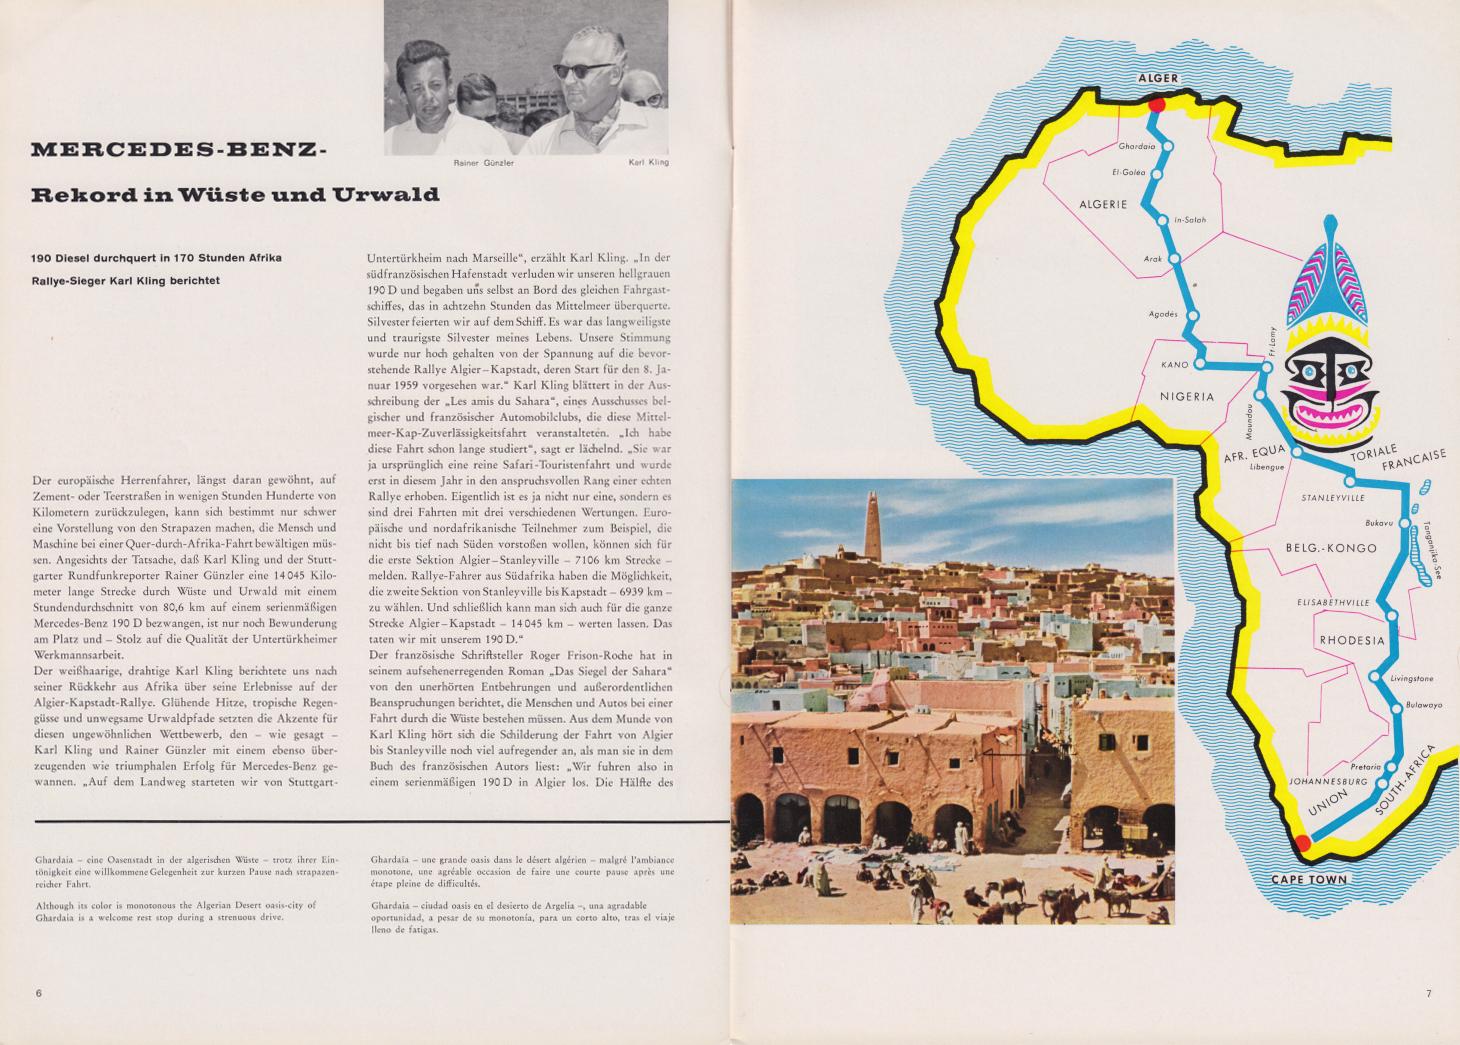 (REVISTA): Periódico In aller welt n.º 31 - Mercedes-Benz no mundo - 1959 - multilingue 004